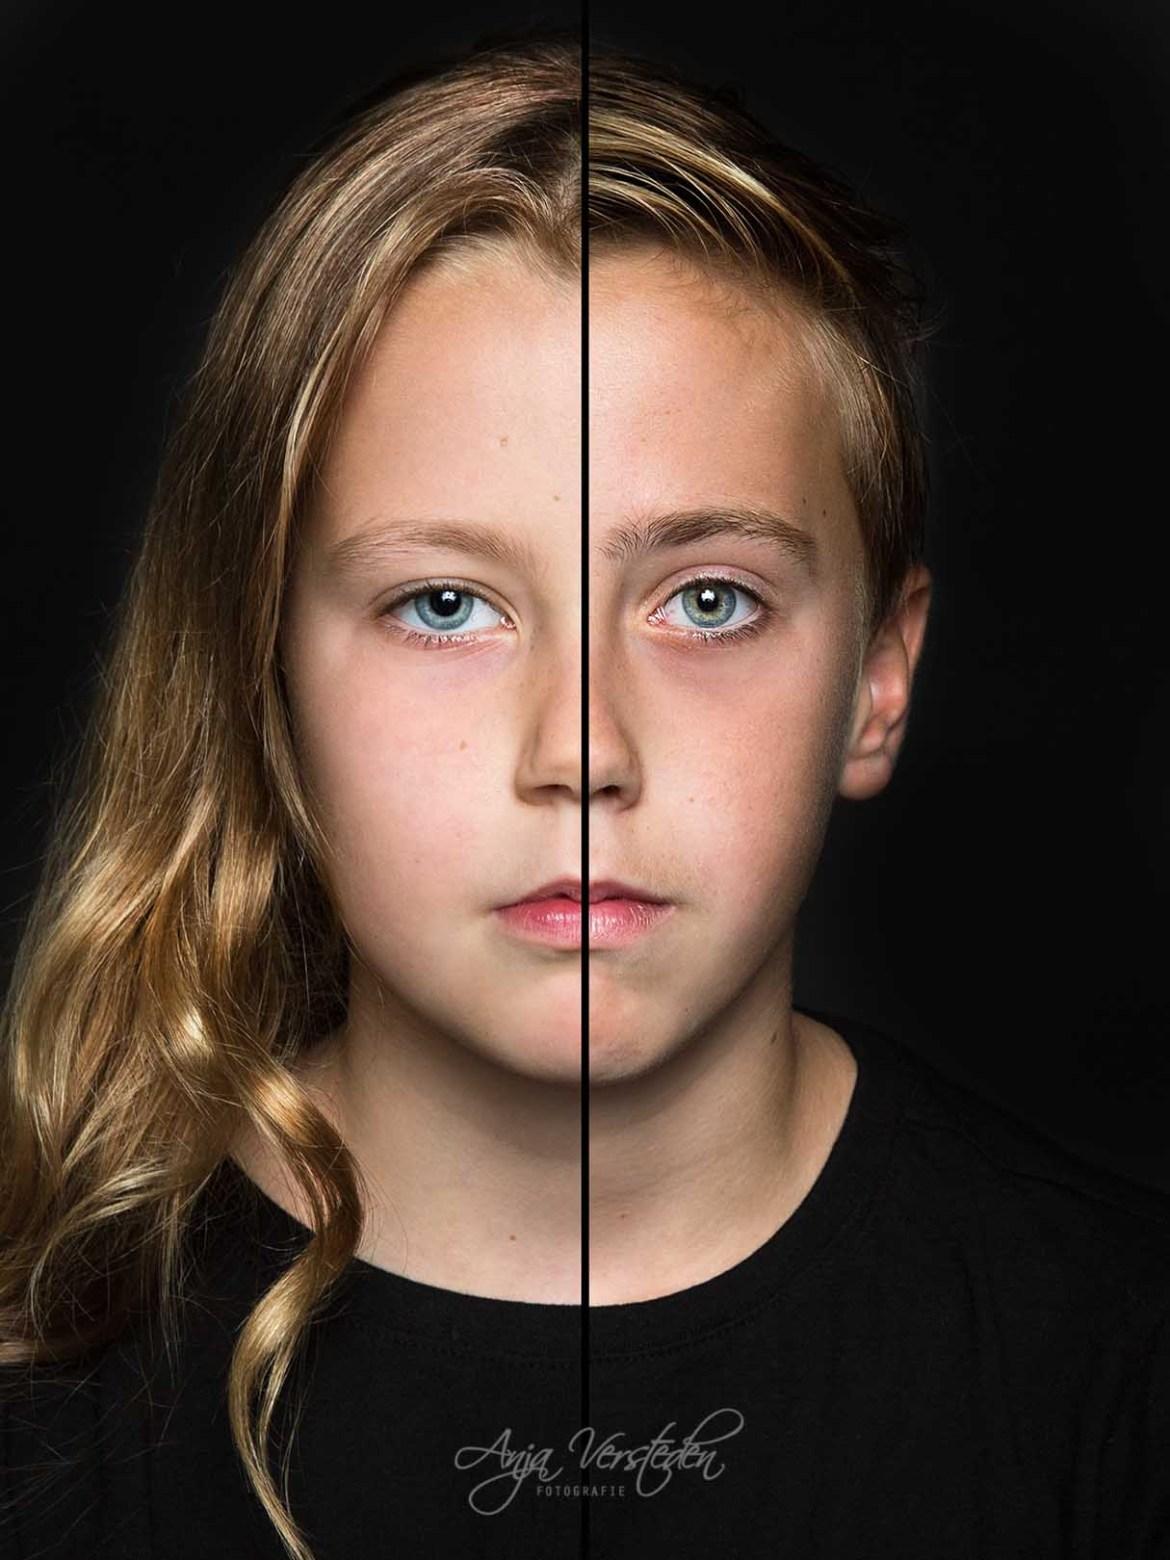 2in1 foto portret 2 in 1 Duo